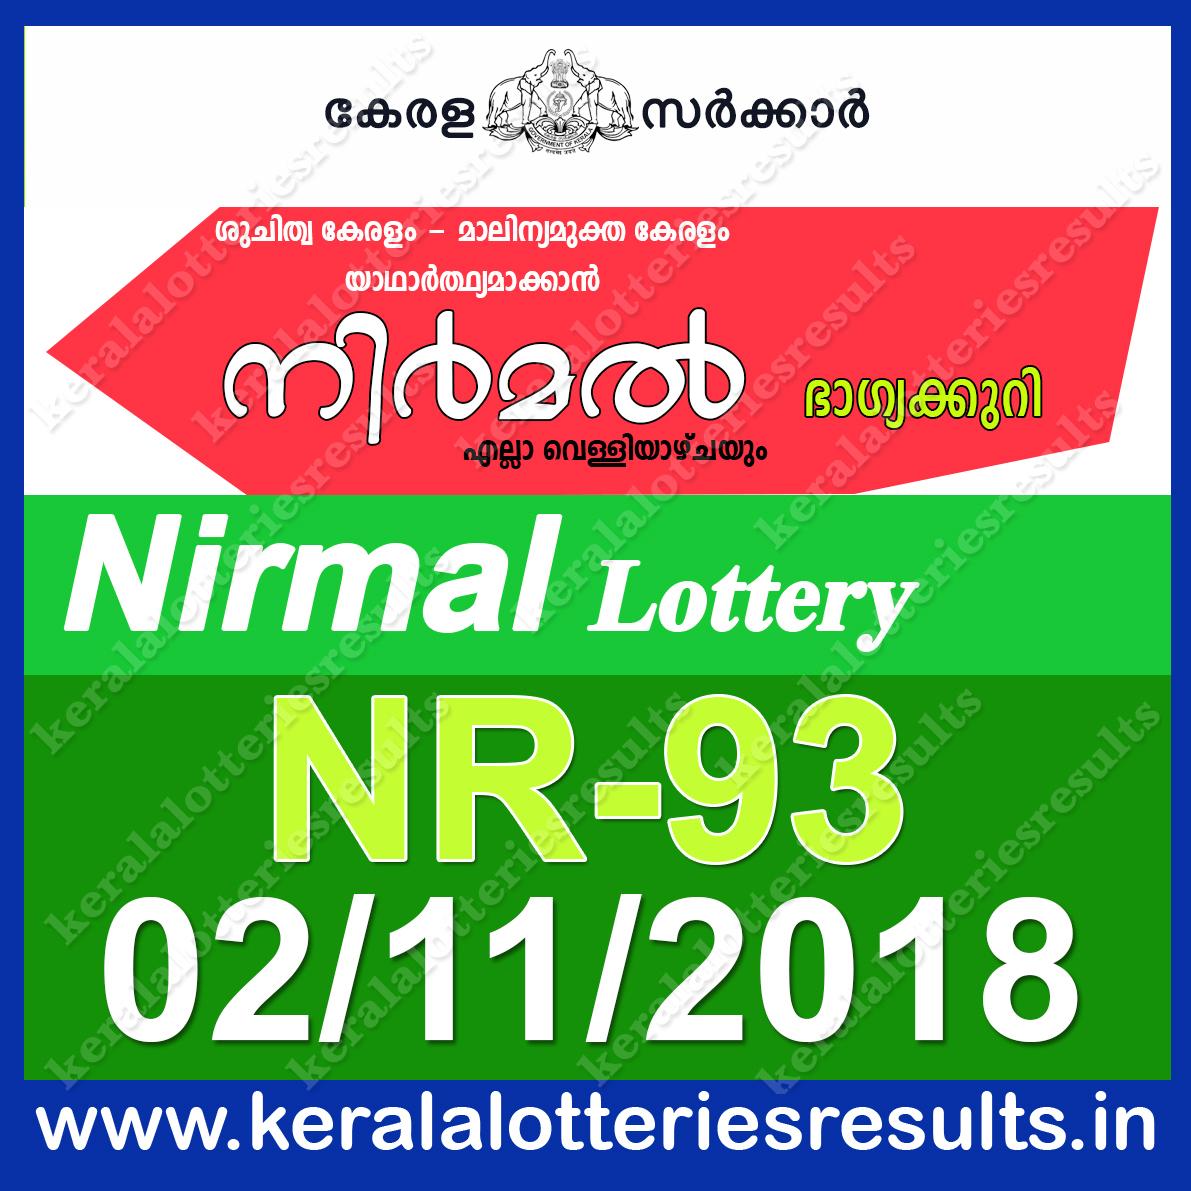 Kerala Lottery Results; 02-11-2018 Nirmal Lottery Result ...